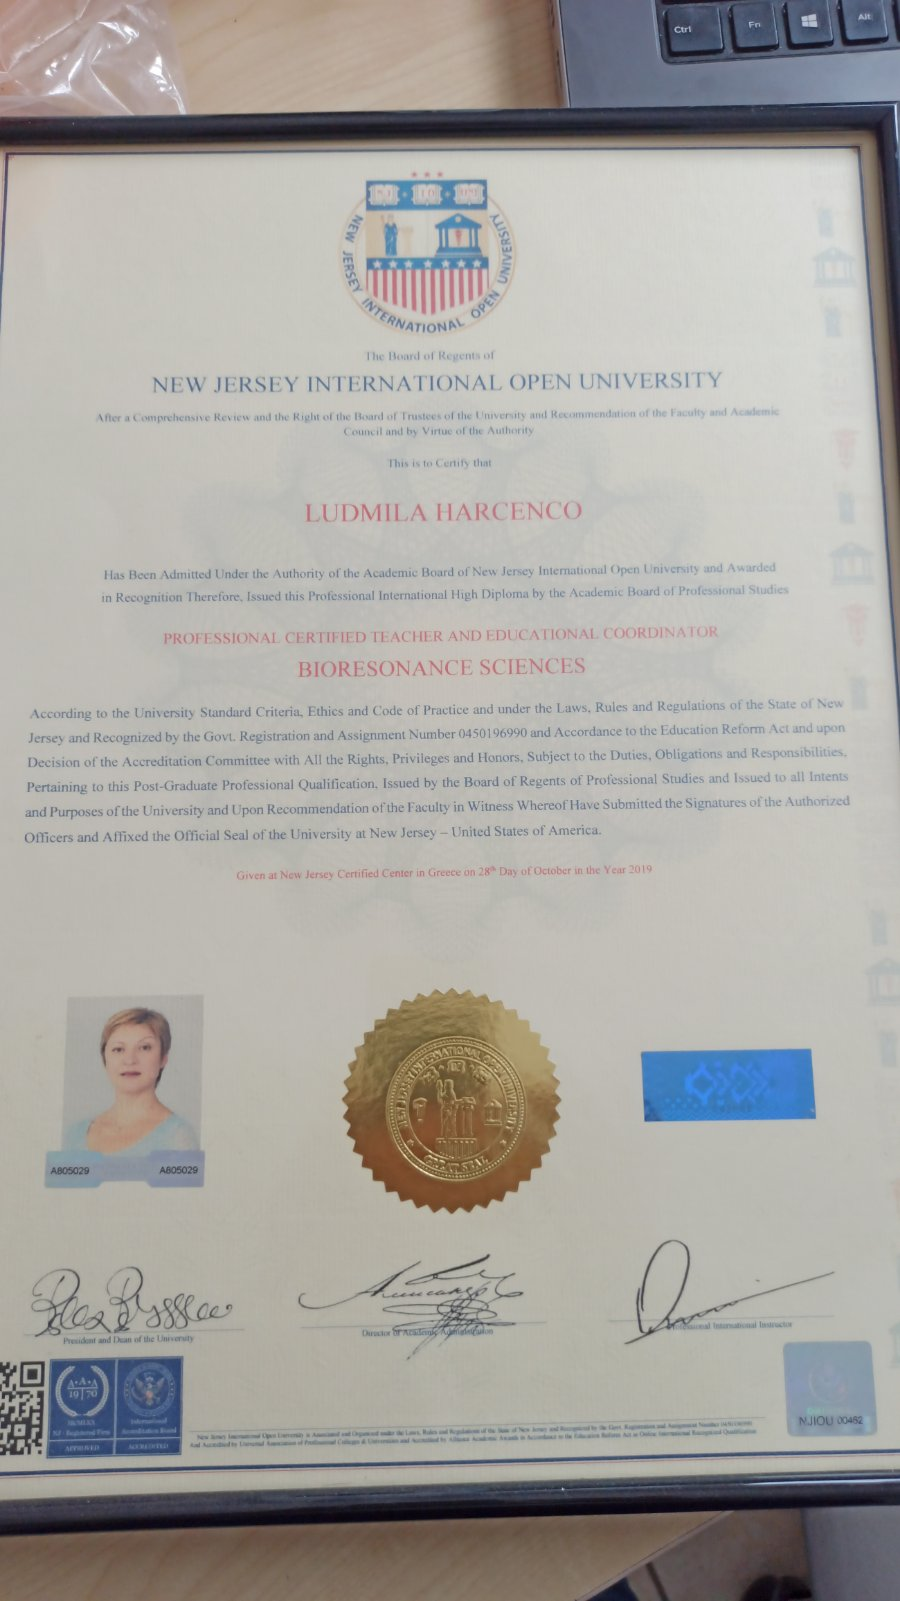 Professional Bioresonance Sciences Teacher - New Jersey International Open University